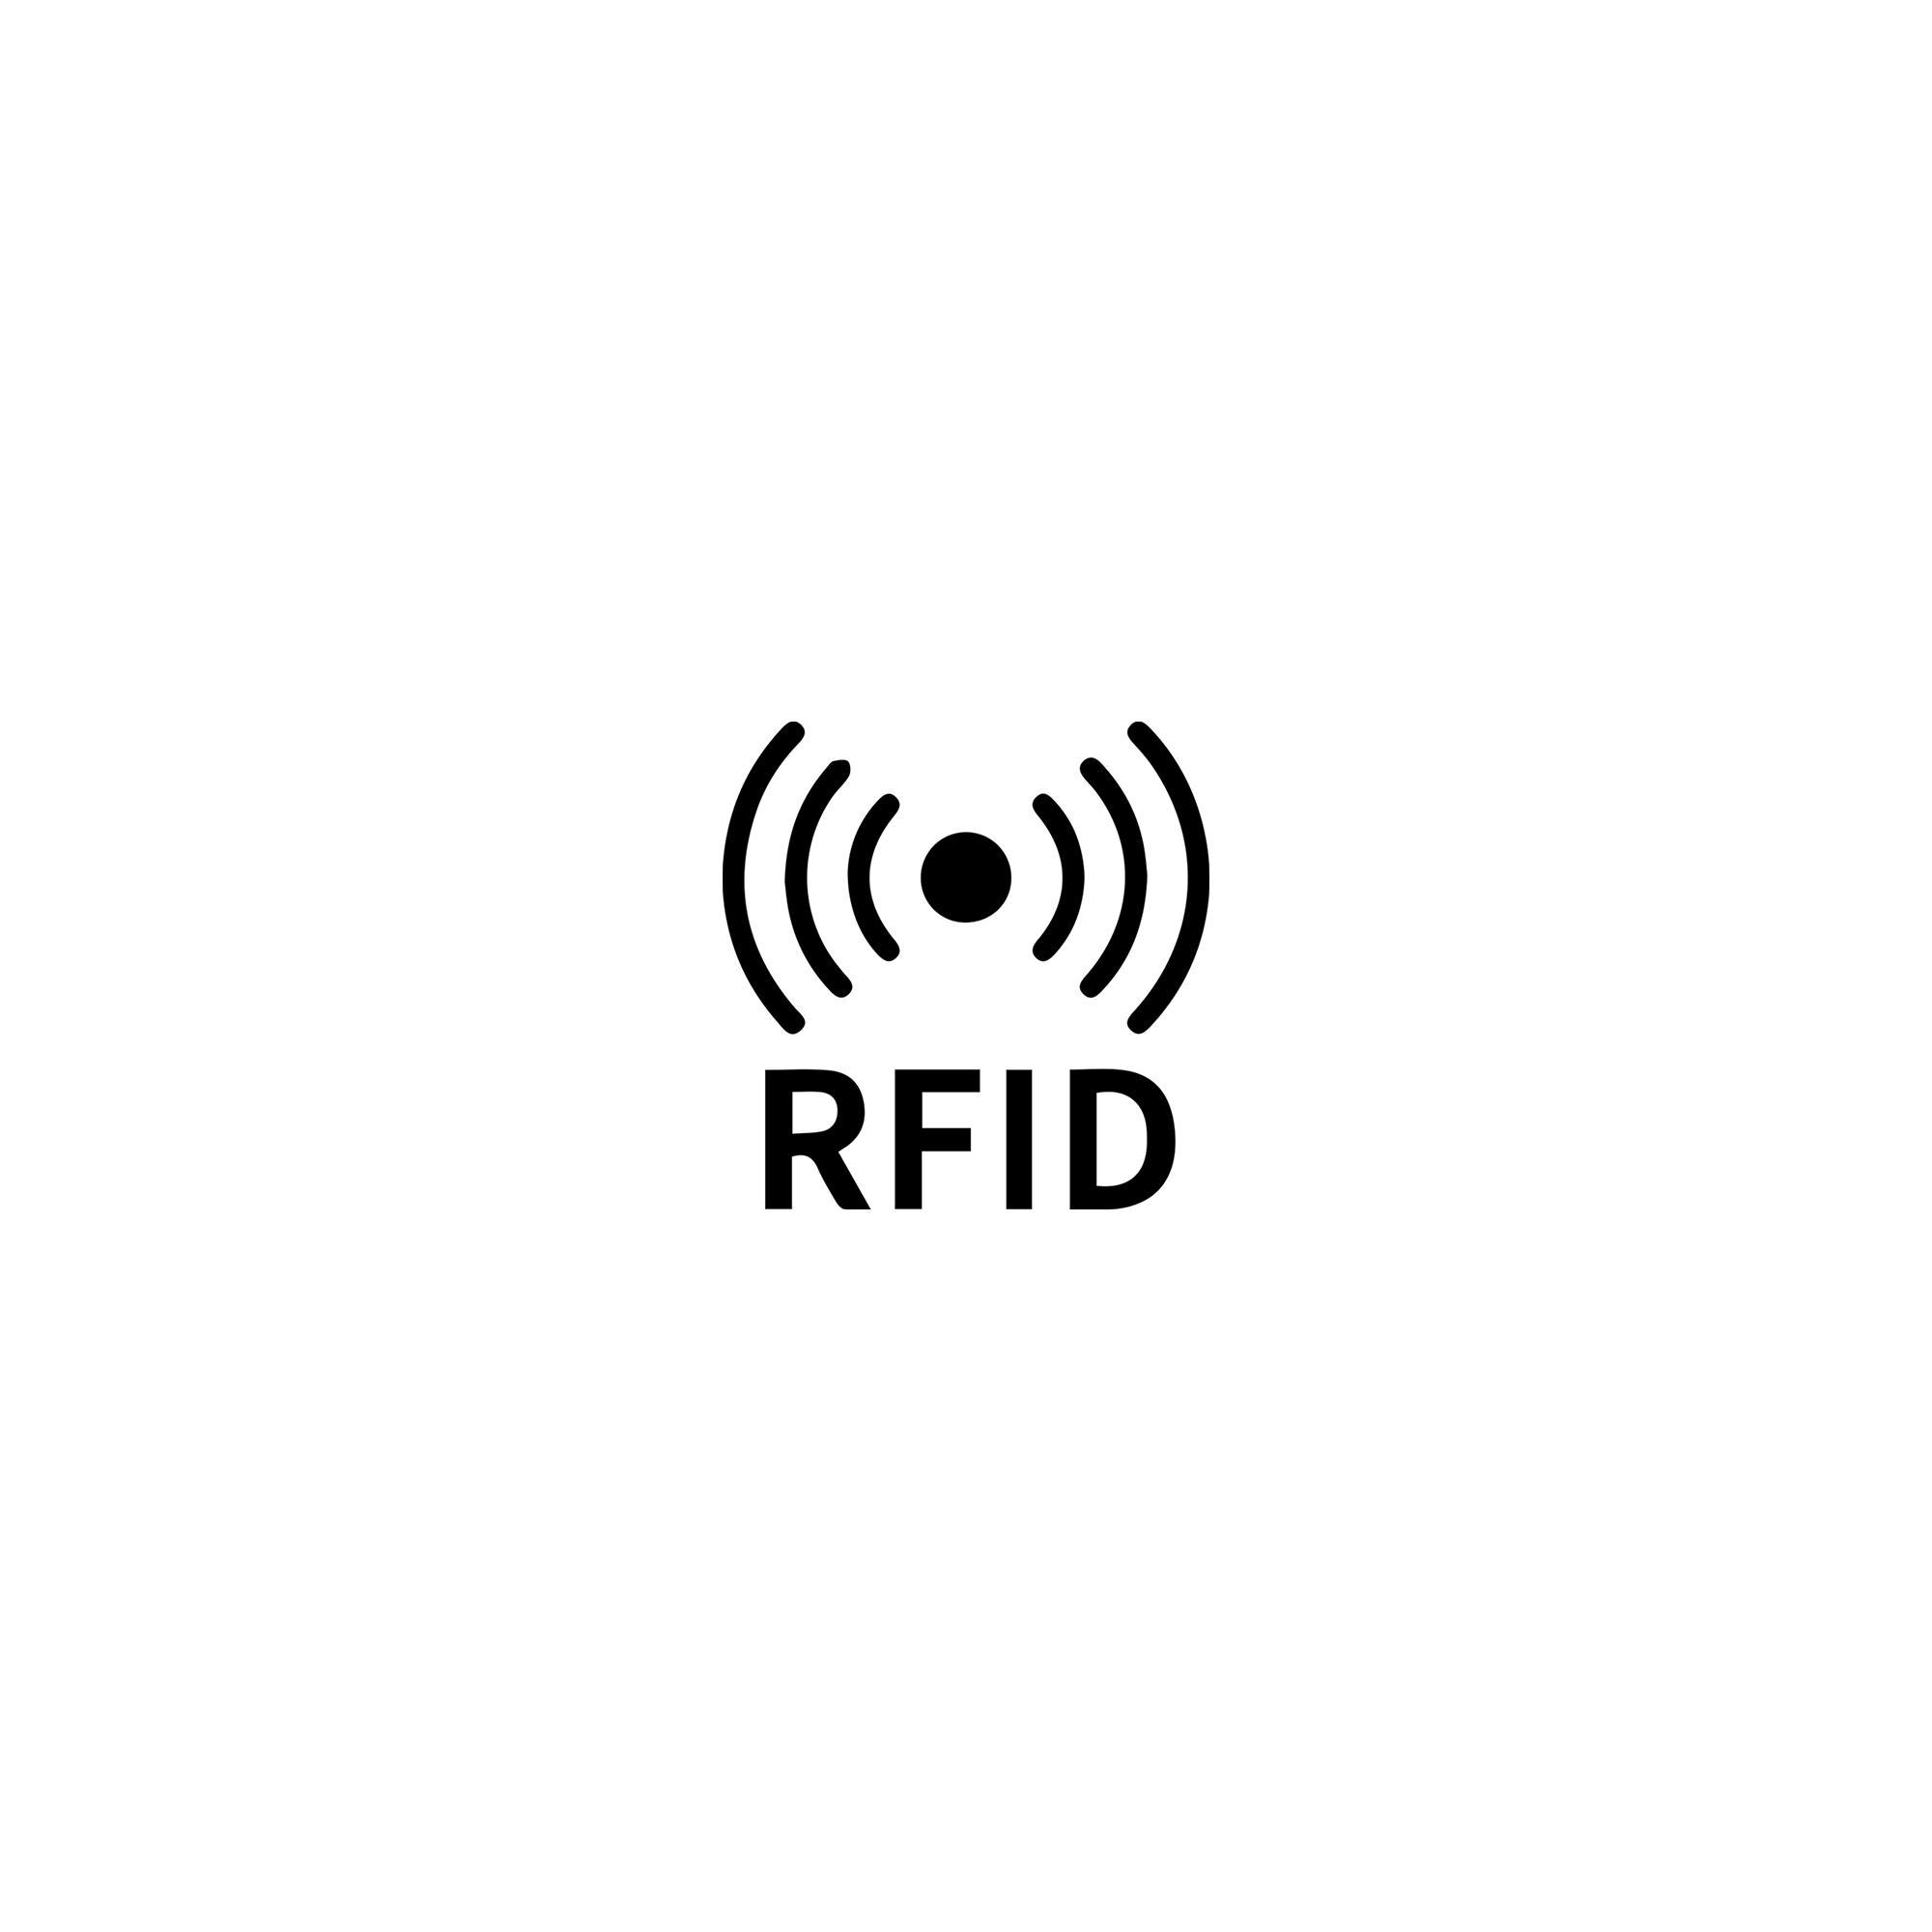 New York Rfid P/f Verticale 8cc NERO